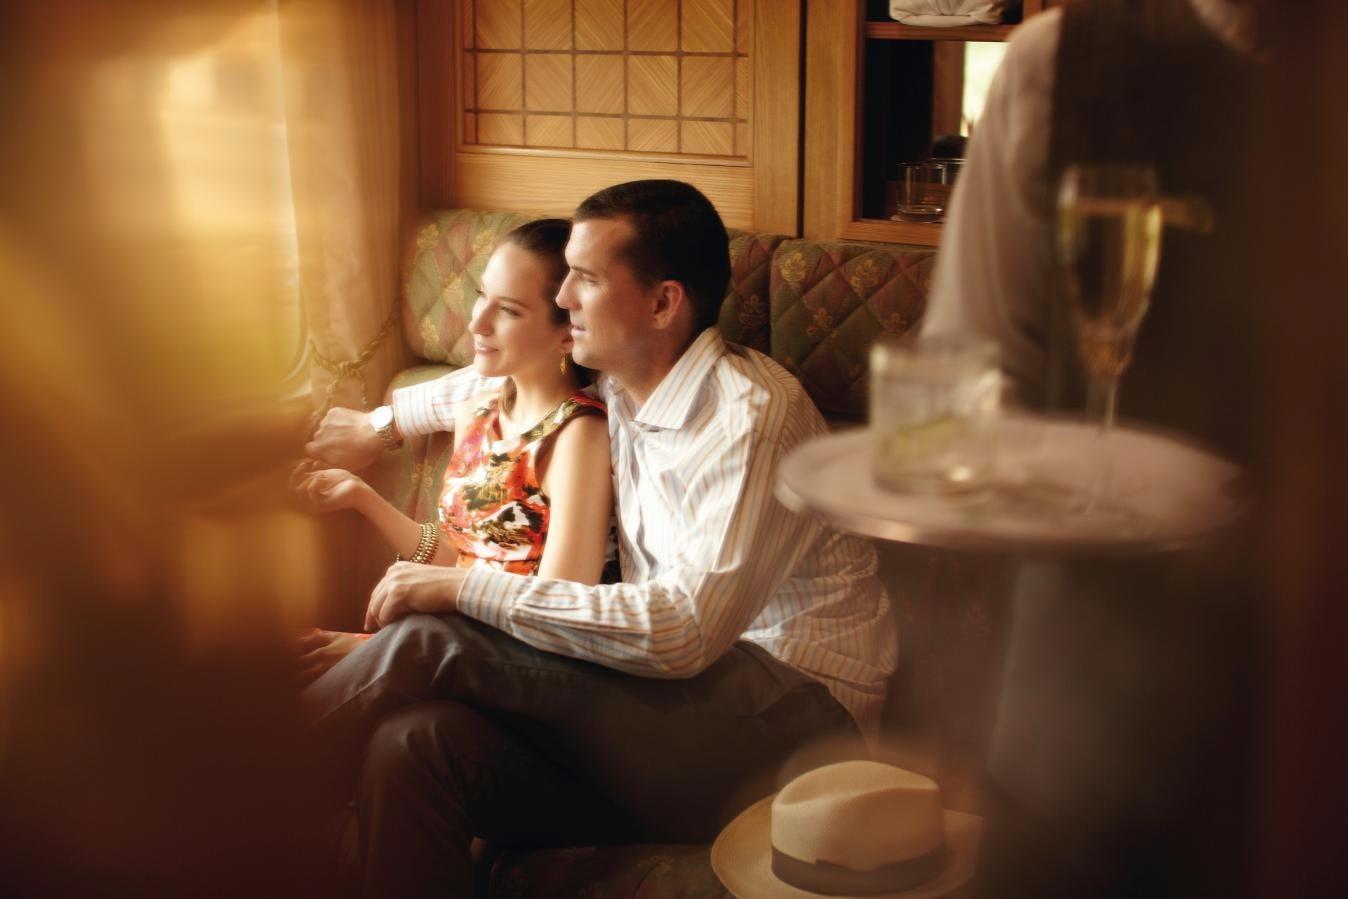 Inessa Kraft, publication, luxury lifestyle